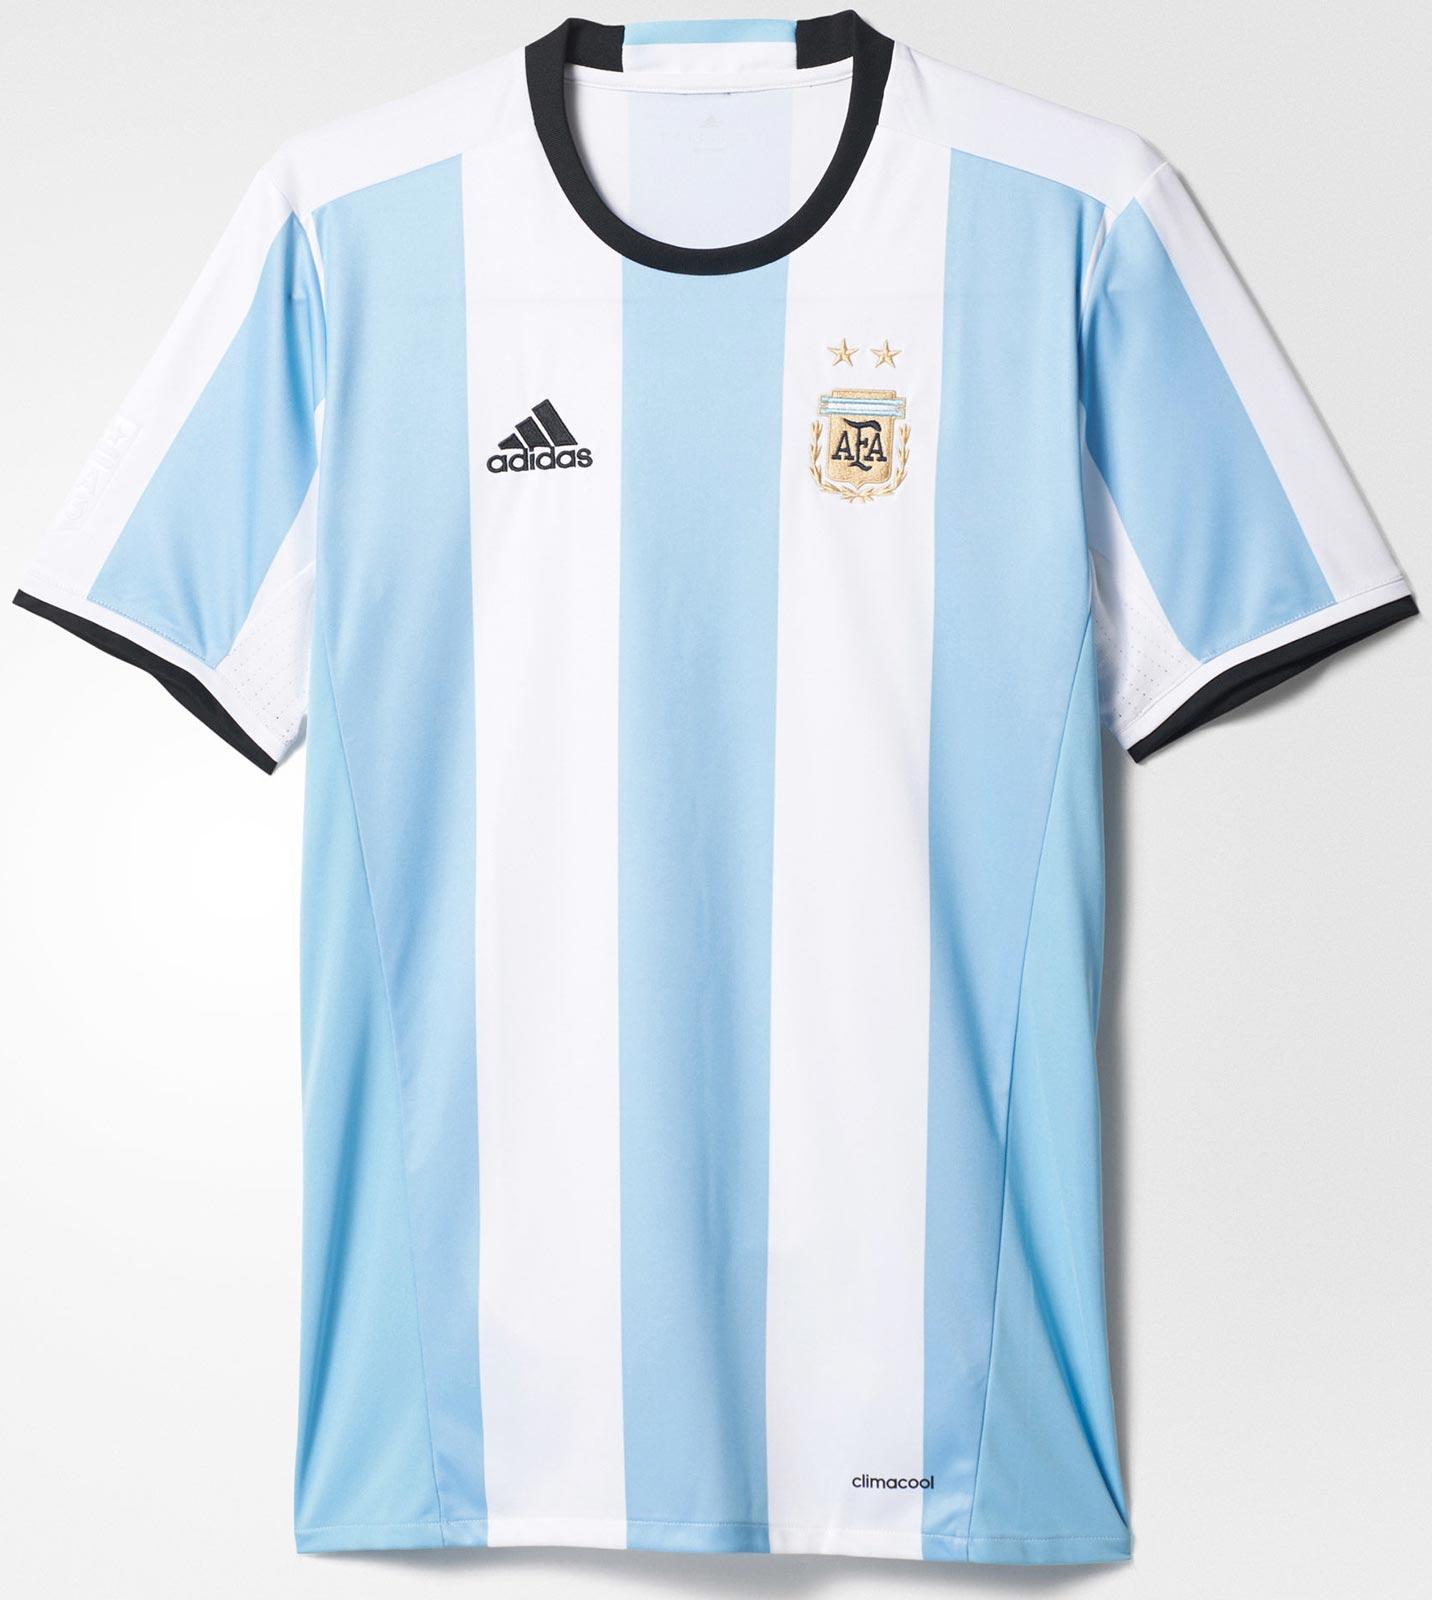 Argentina 2016 copa america kit released footy headlines for Cuarto kit del america